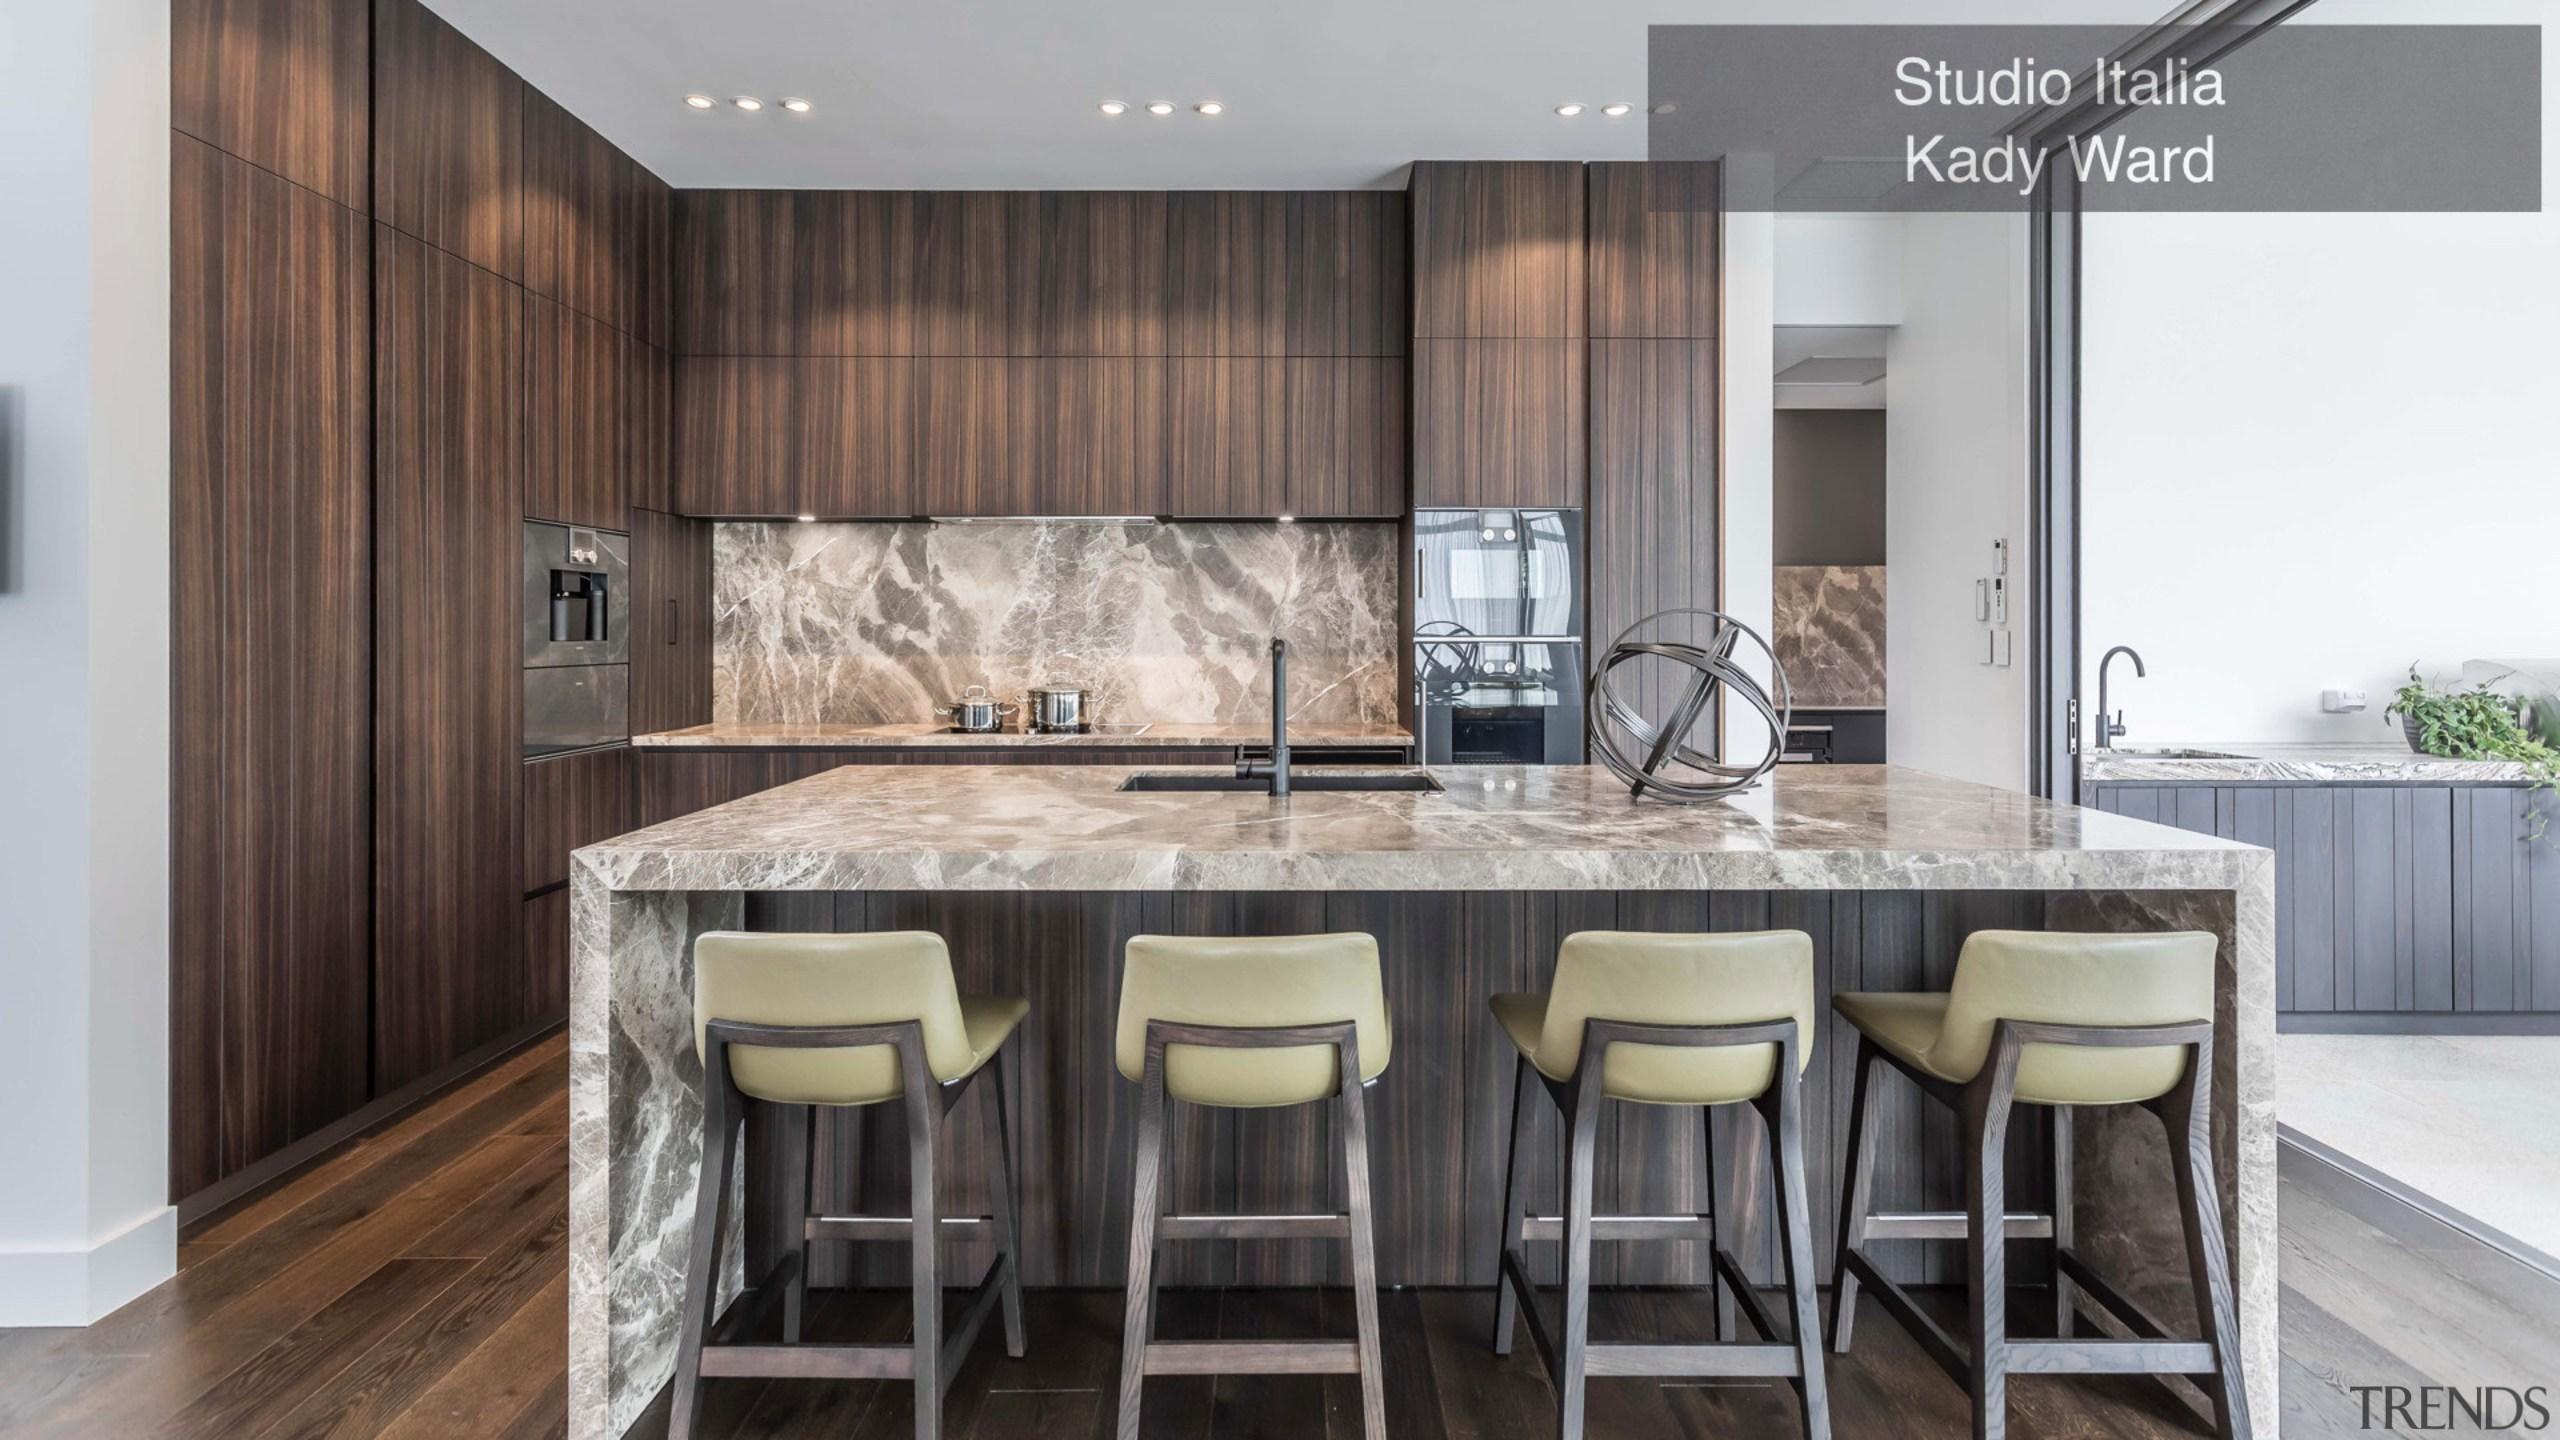 Highly Commended – Studio Italia, Kady Ward – cabinetry, countertop, cuisine classique, interior design, kitchen, real estate, gray